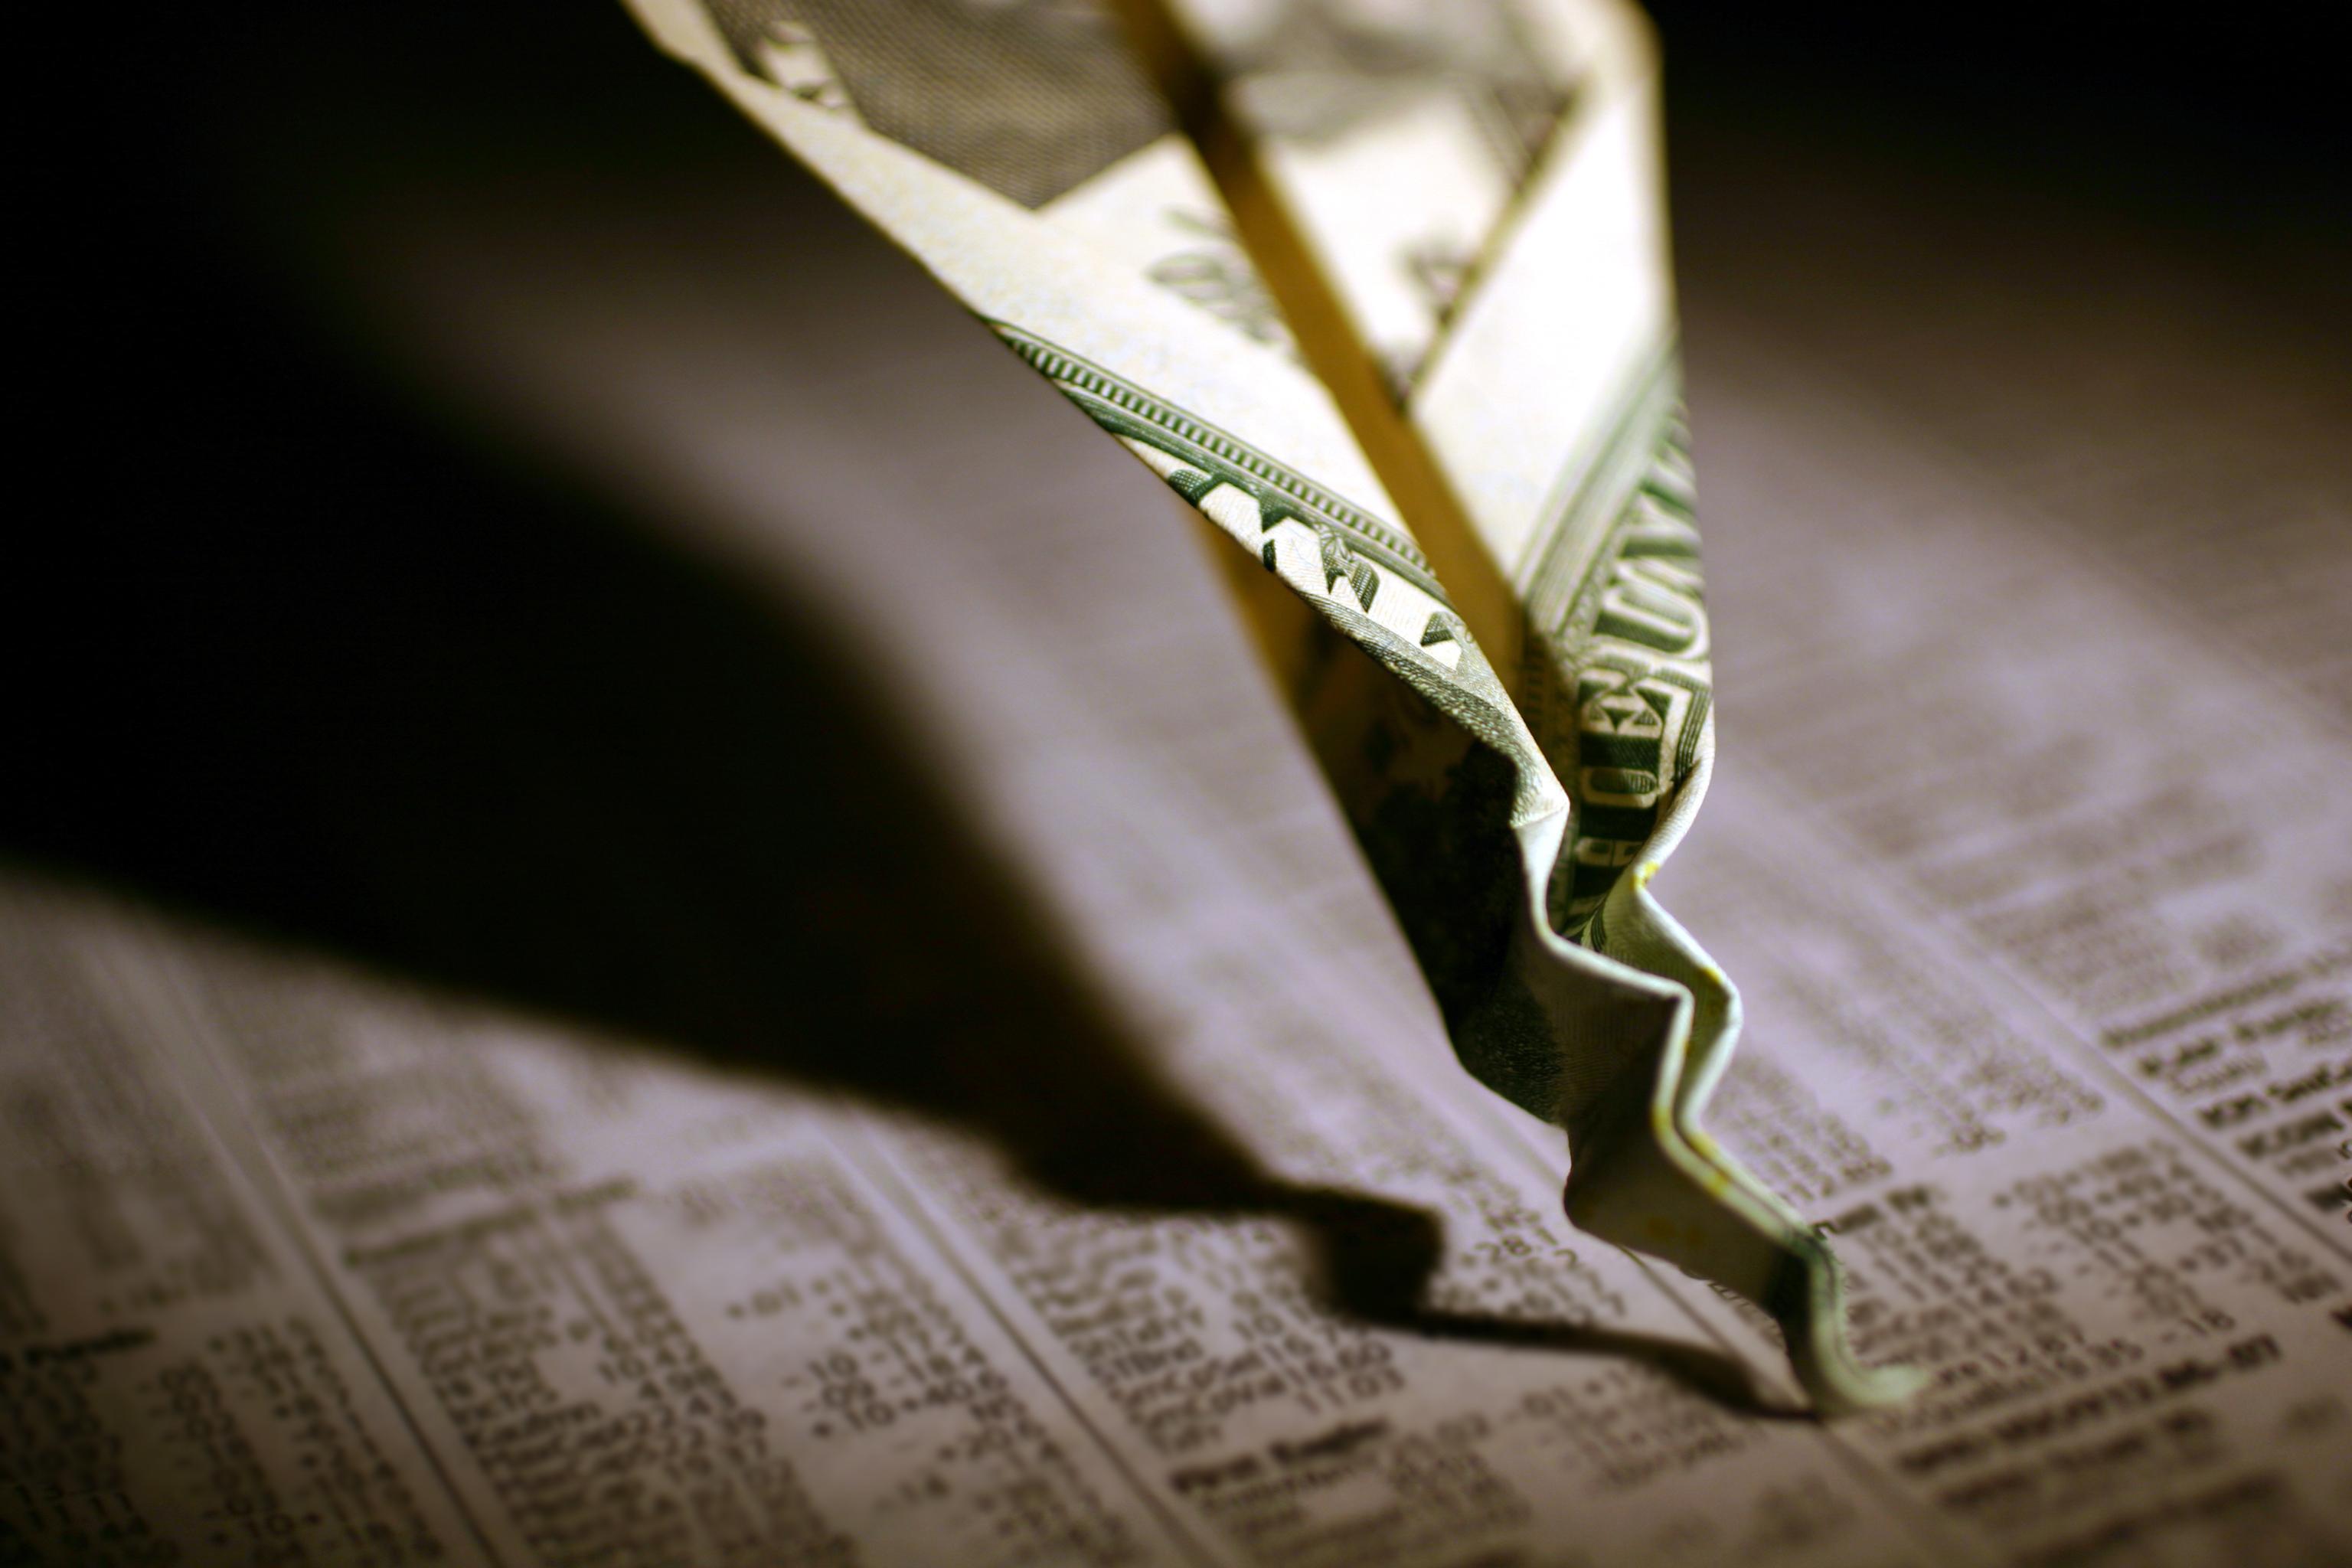 Stock Market Crash 2.0: A Perfect Storm Is Brewing